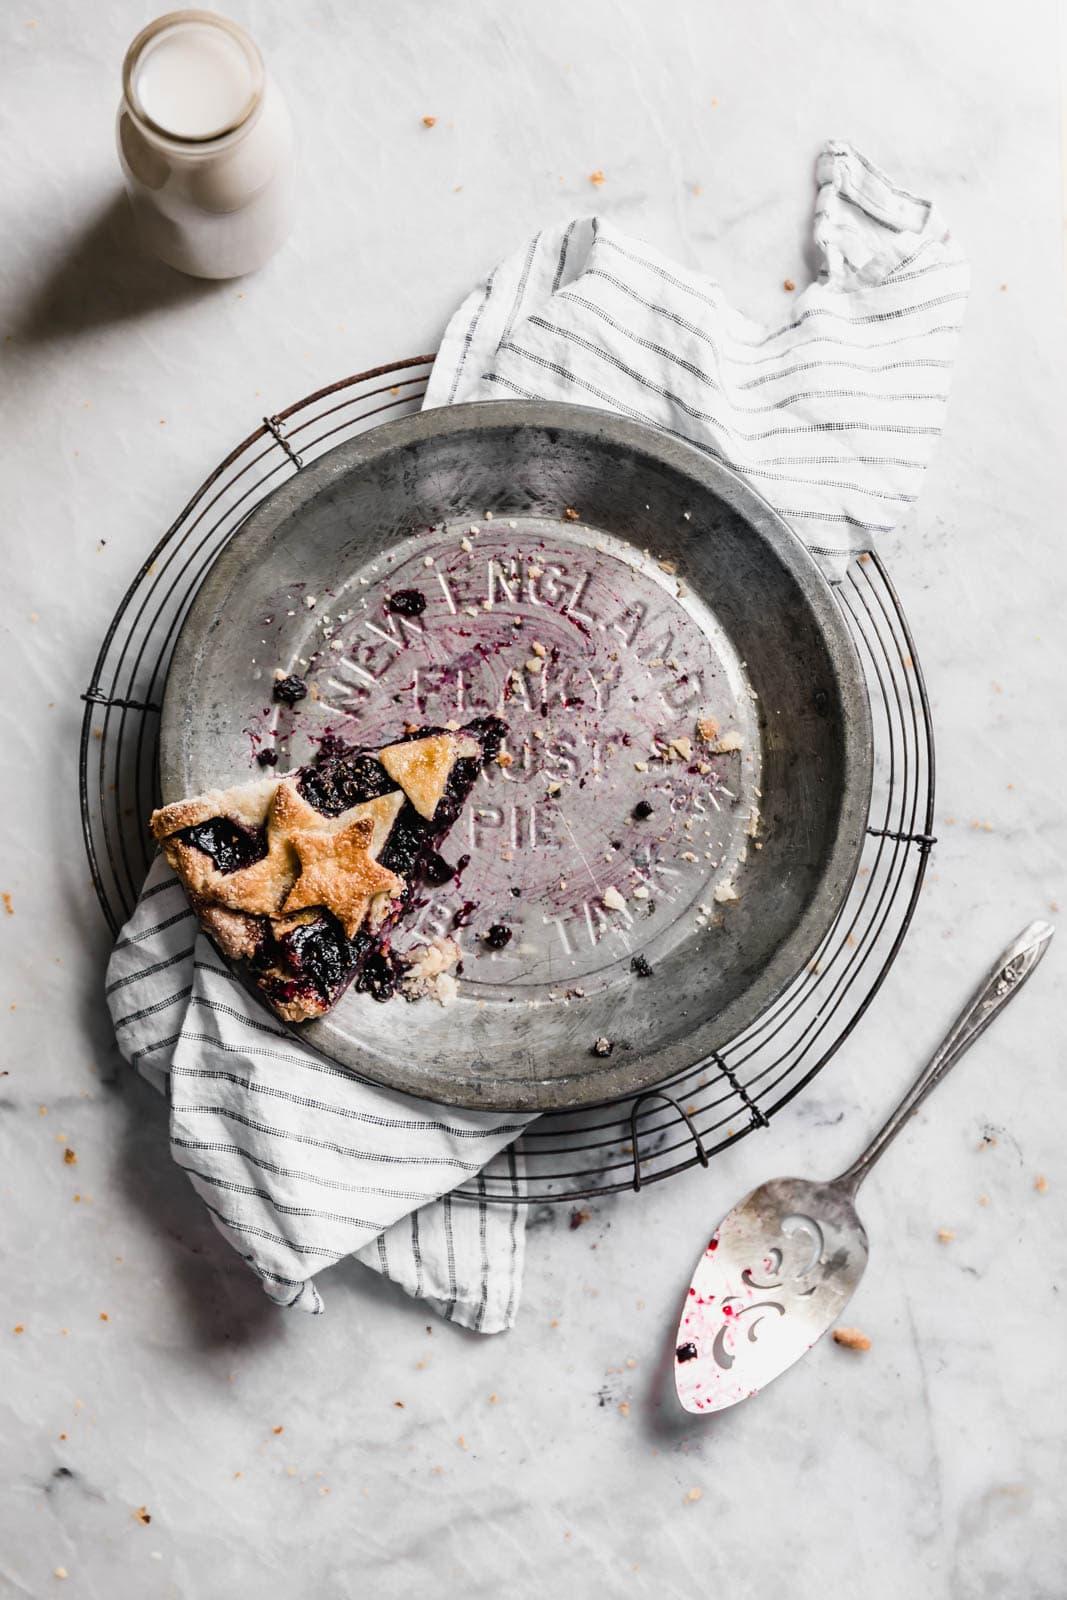 fresh blueberry pie slice in empty pie pan